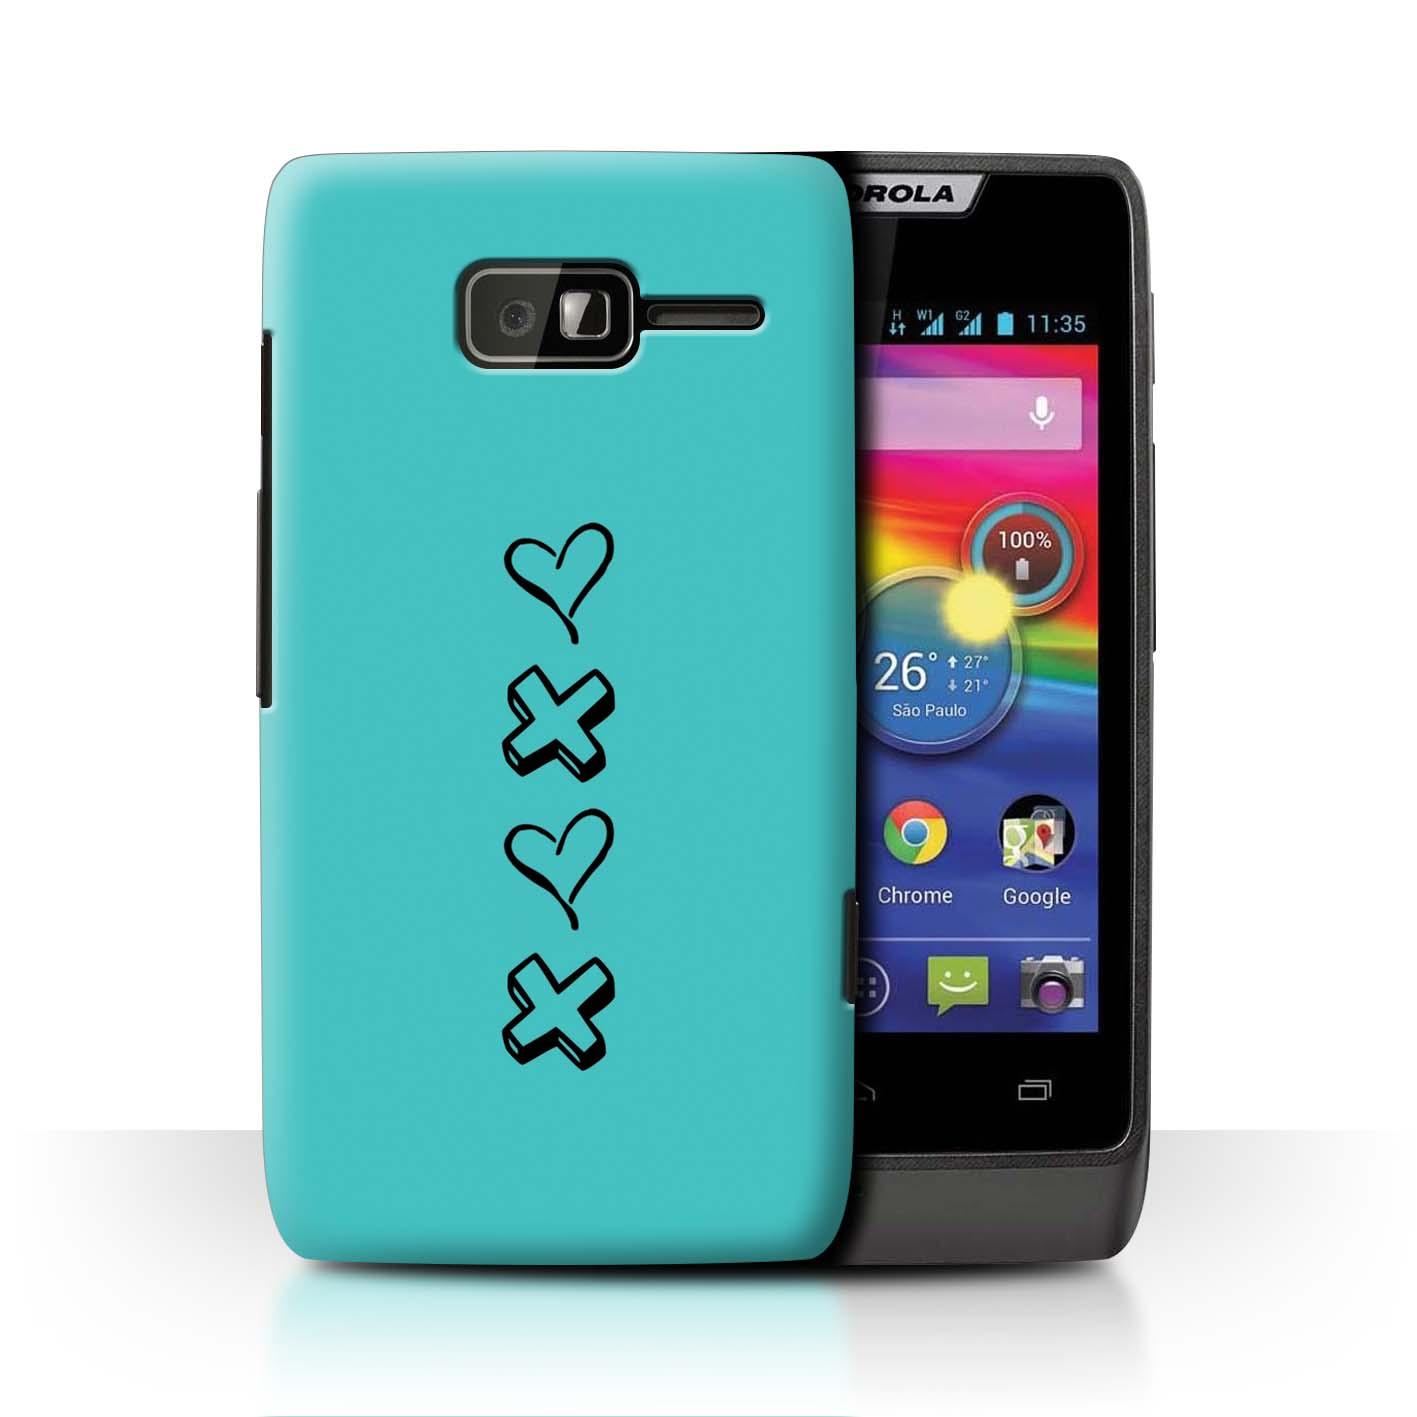 Stuff 4 teléfono caso/cubierta trasera para Motorola Razr D1/Corazón Xoxo